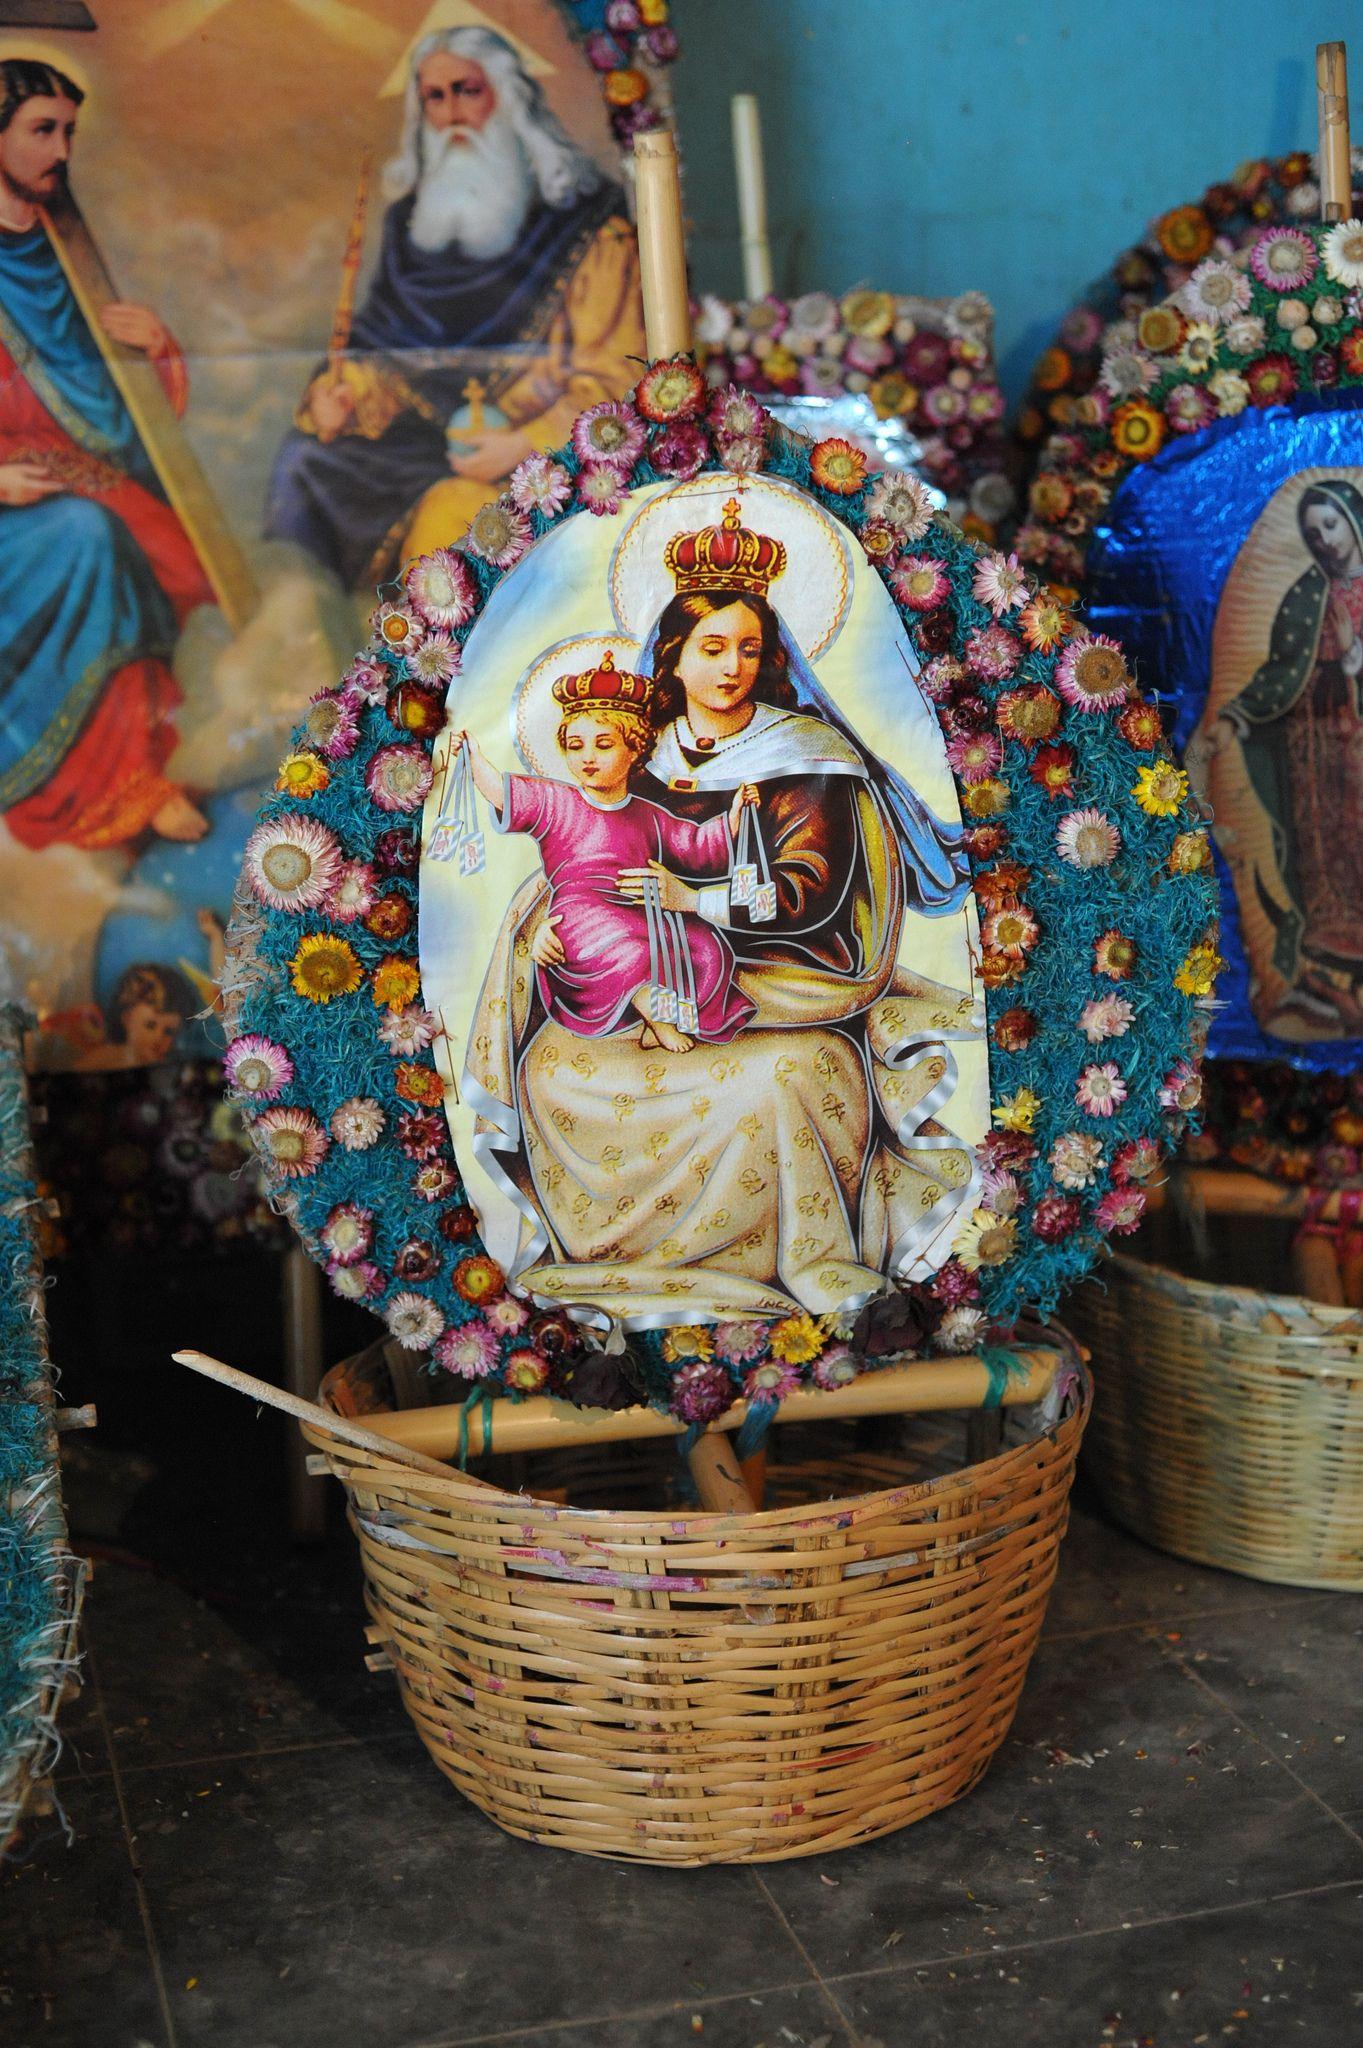 Viva la Virgen del Carmen MOTHER OF GOD